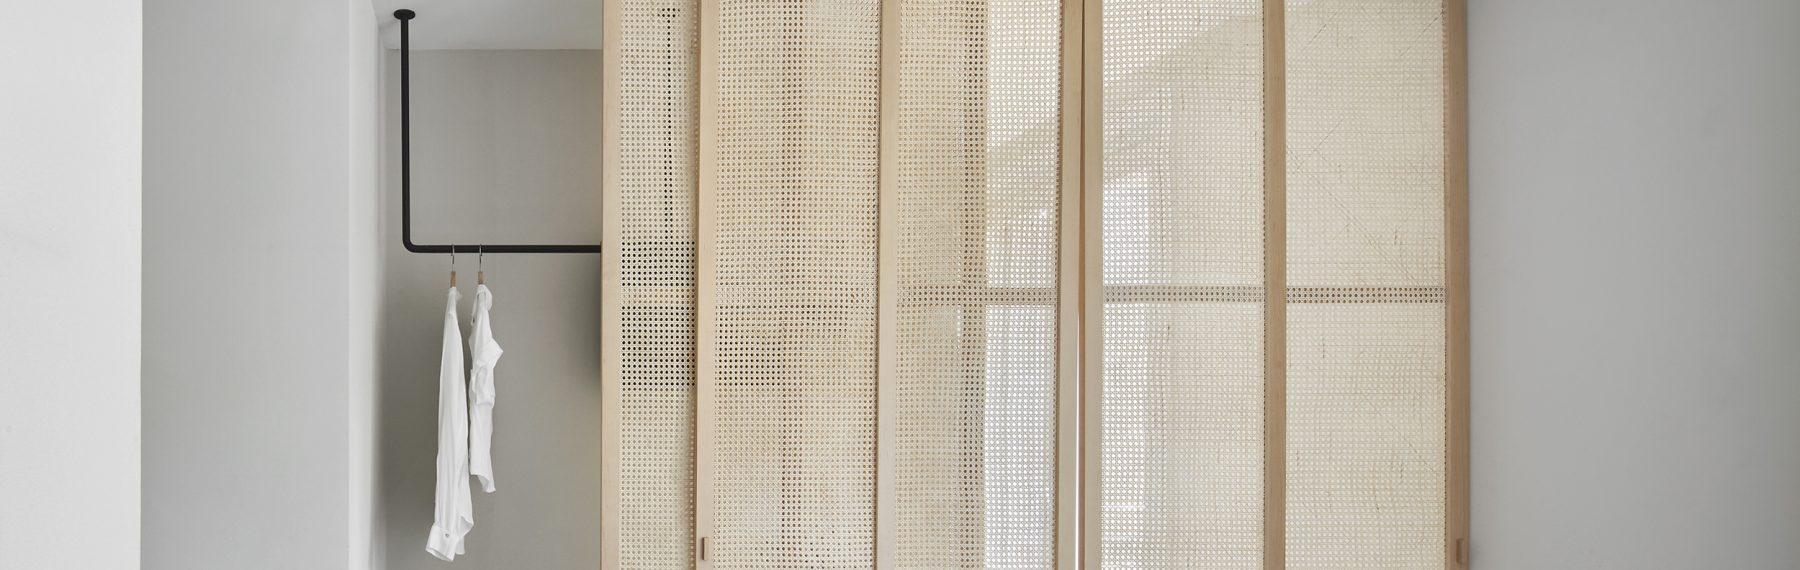 Interiorismo barcelona miriam barrio - Miriam barrio ...